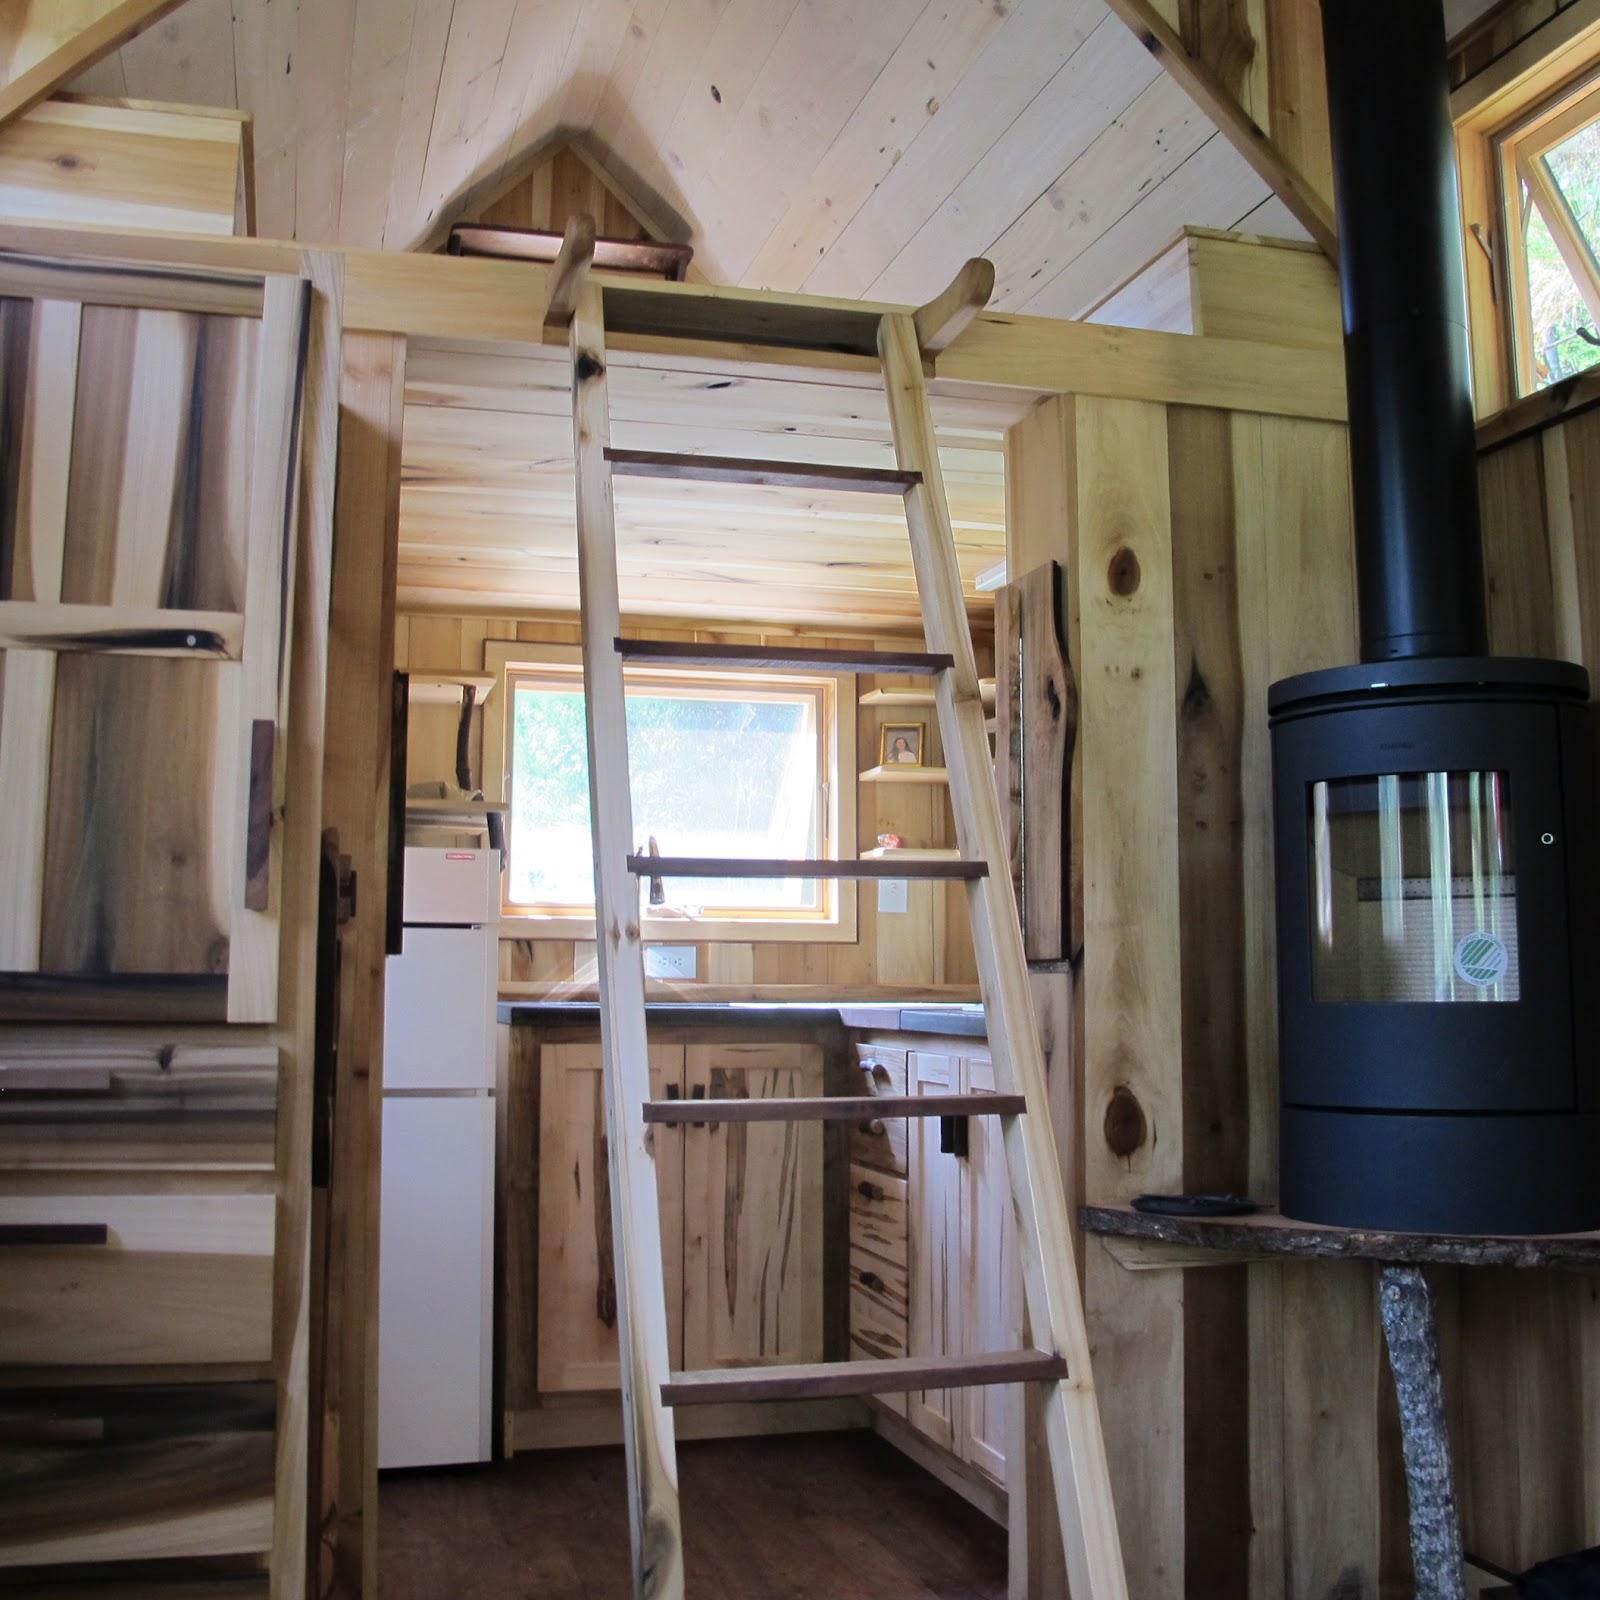 Small Homes Interiors: Owl Creek Happenings: Tumbleweed Traveling